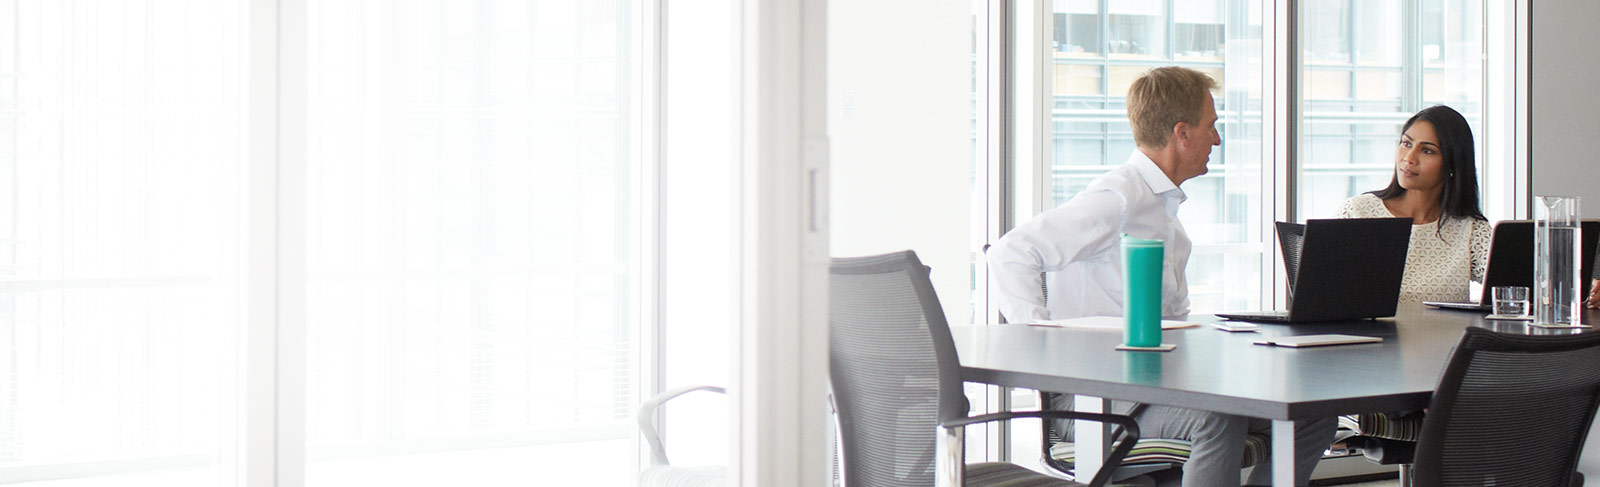 Dva zaposlenika s prijenosnim računalima u sobi za sastanke koriste Office 365 Enterprise E3.